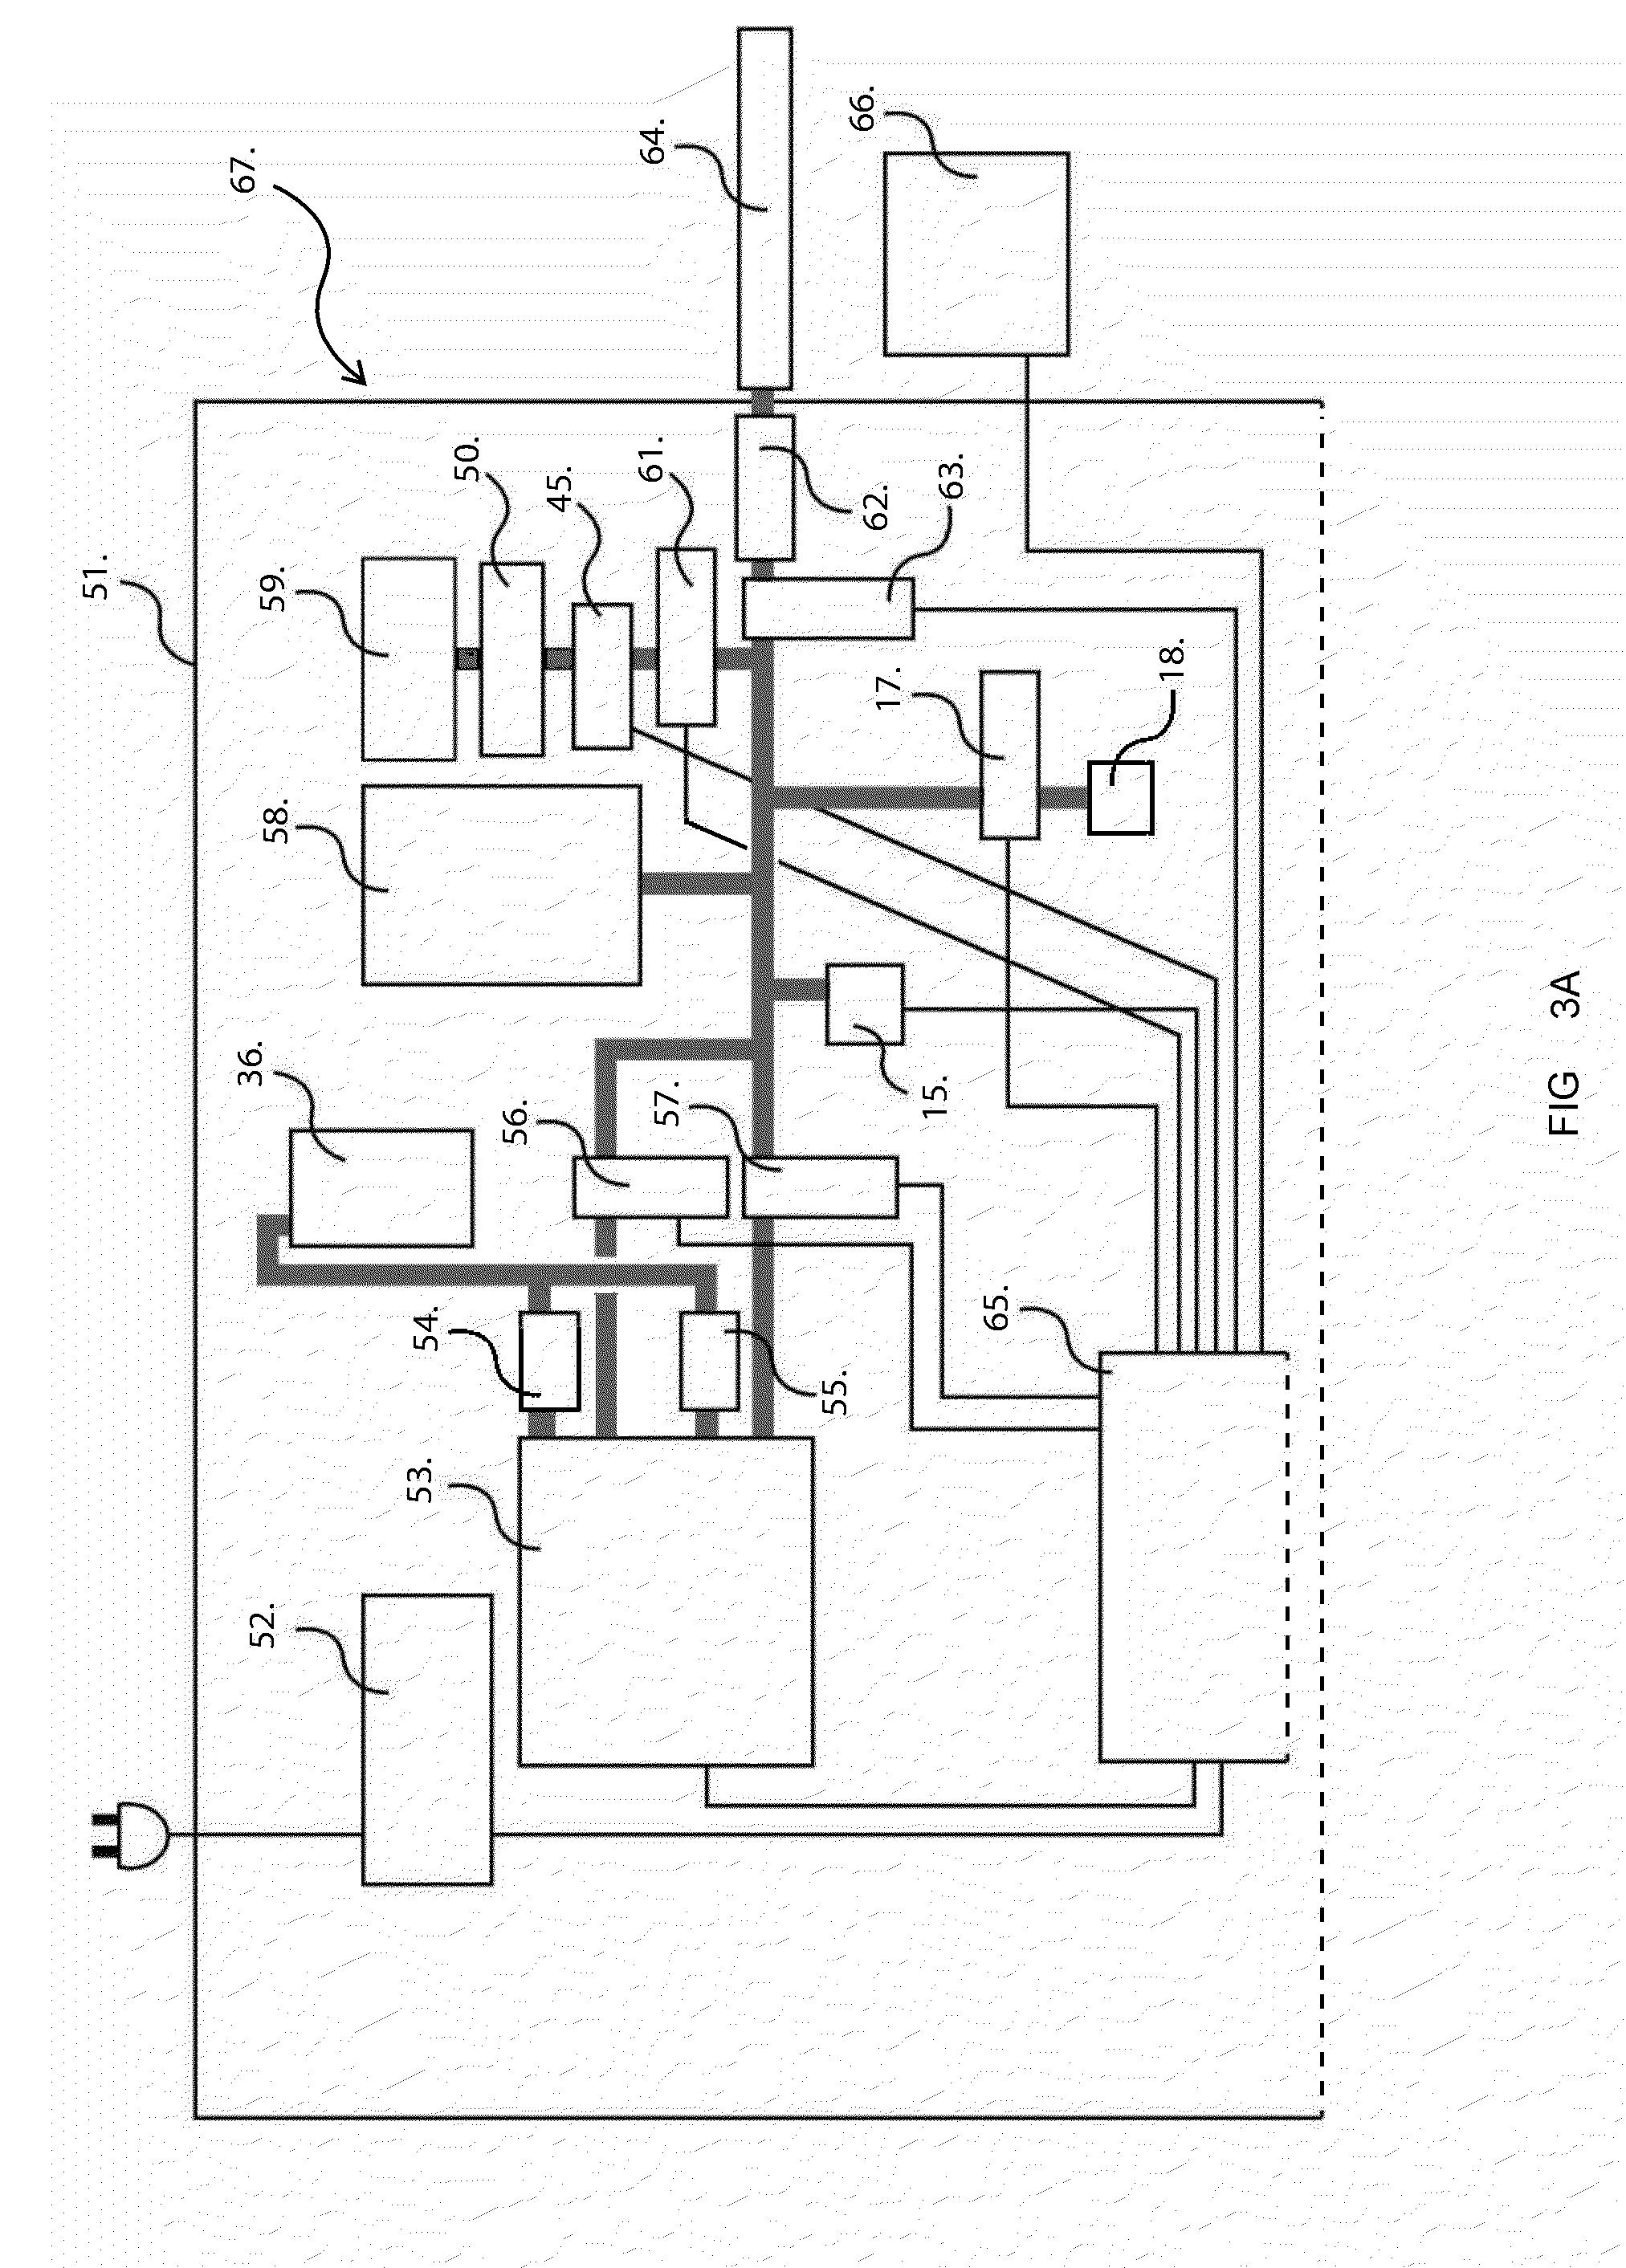 Fuse Box Wiring Diagram 1995 Hummer H1 Com